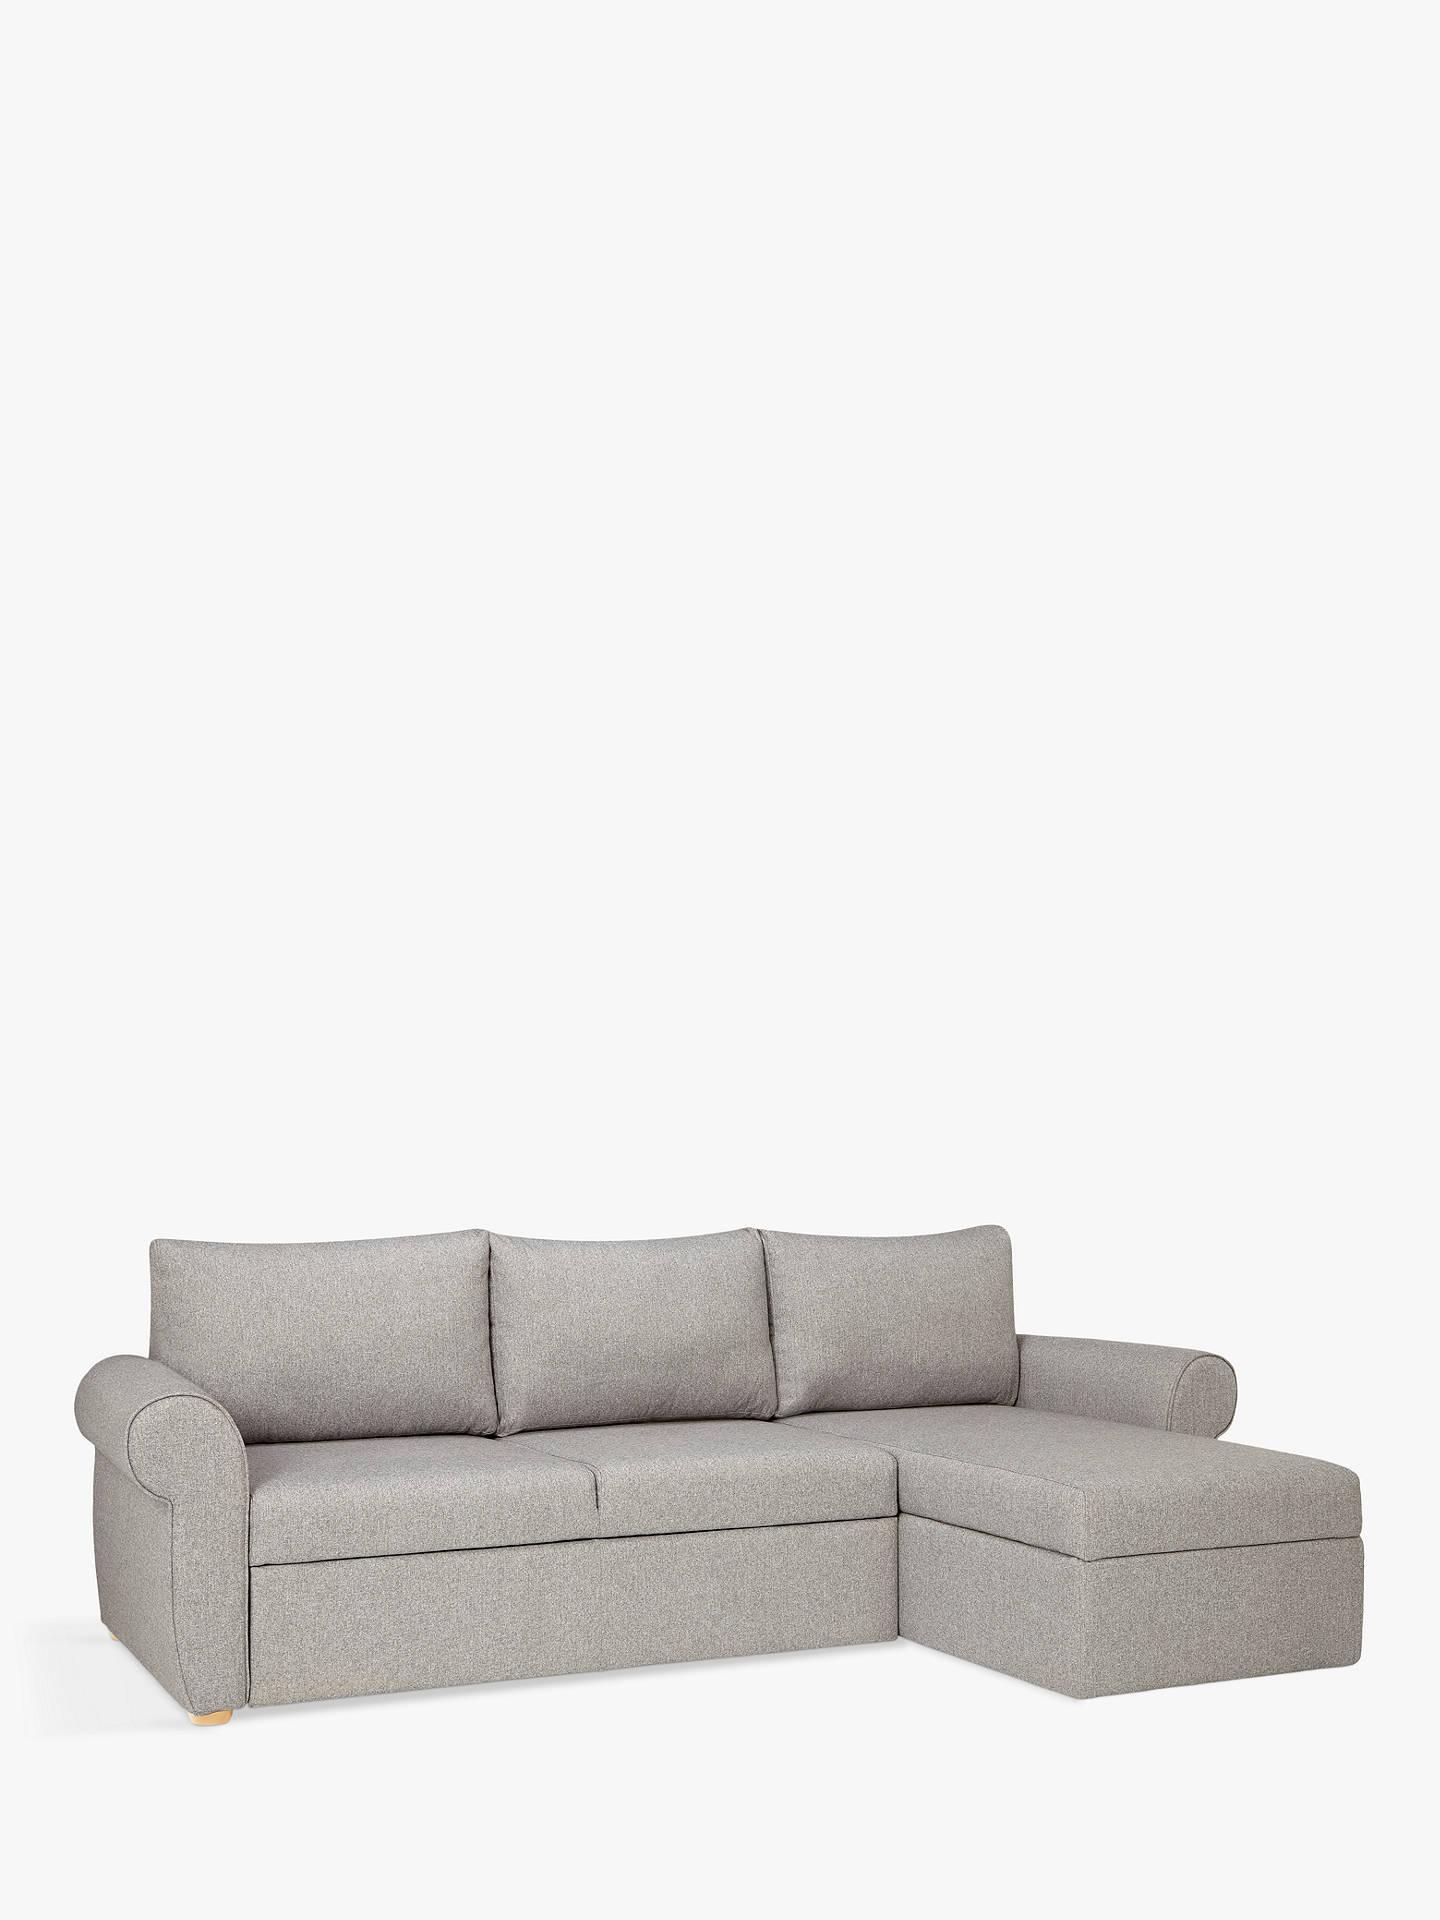 Strange John Lewis Partners Sansa Scroll Arm Sofa Bed Interior Design Ideas Clesiryabchikinfo